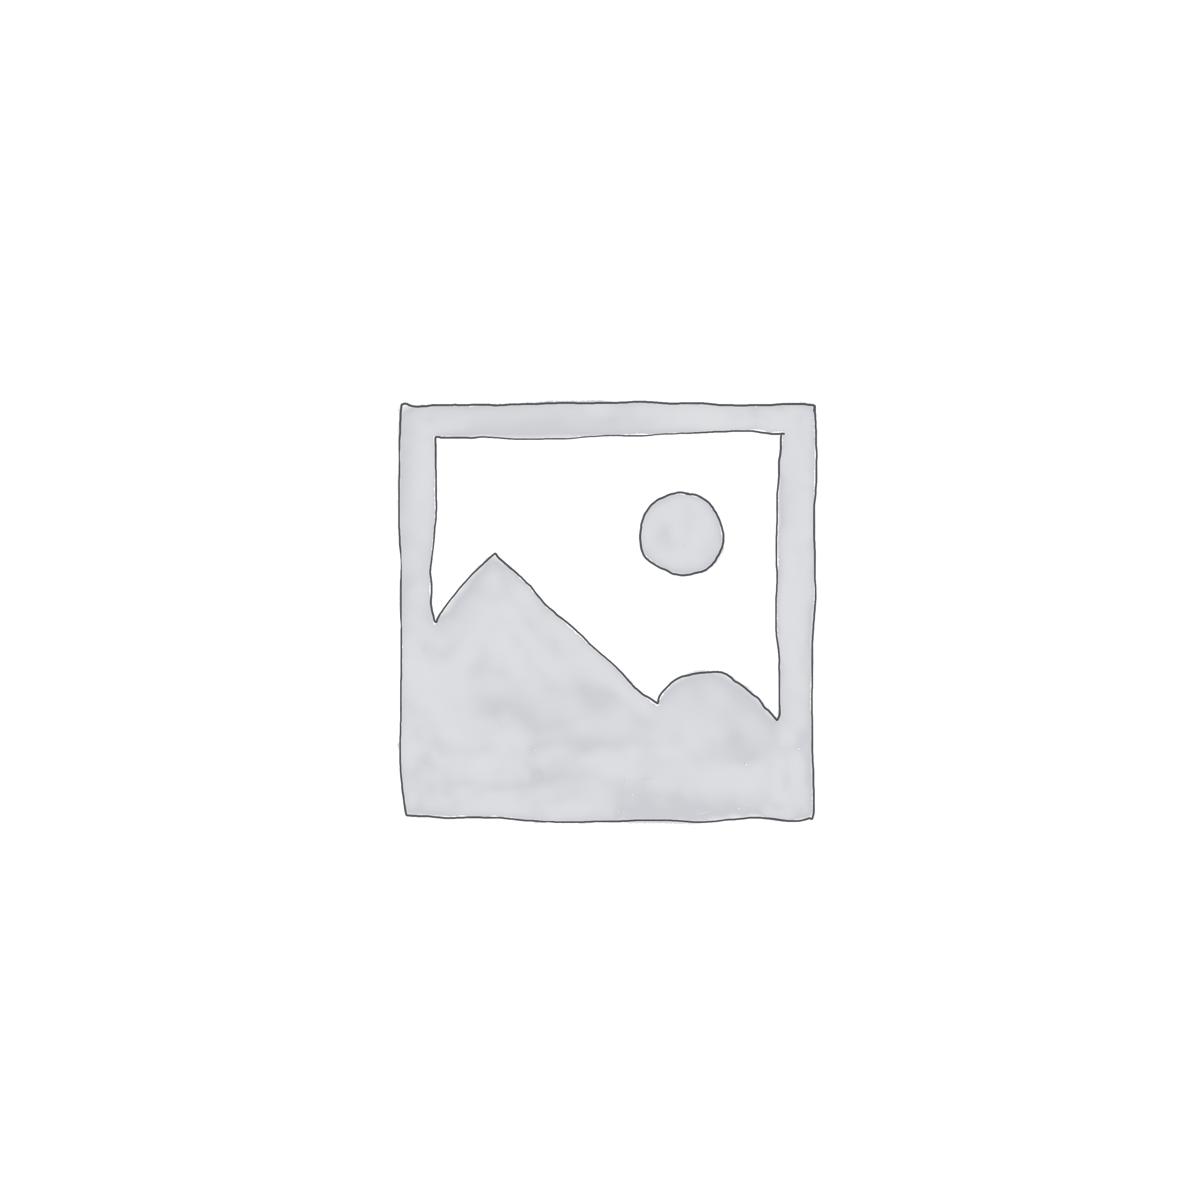 Amethyst (vein) /Sowbelly Agate